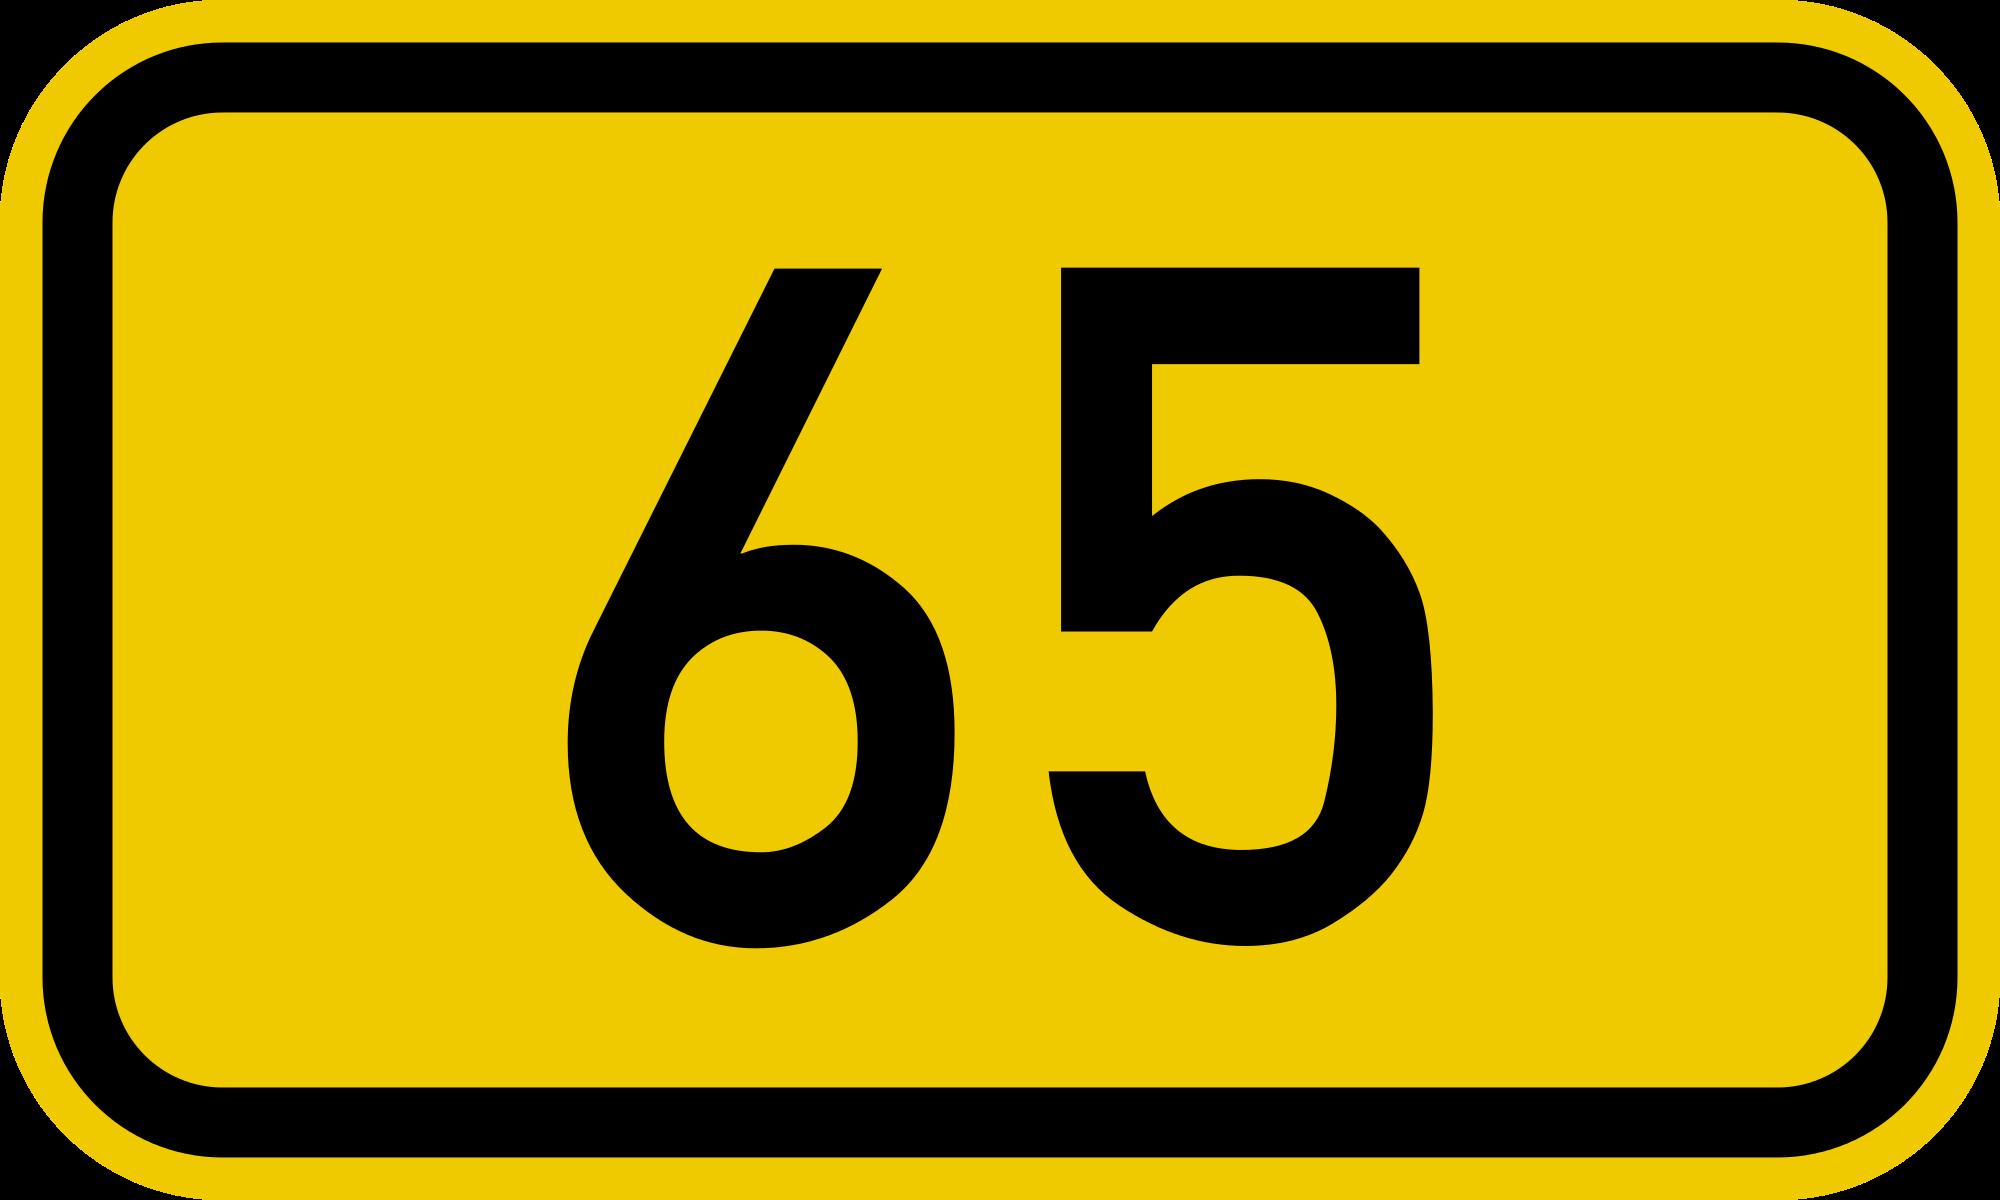 File:Bundesstraße 65 number.svg - Wikimedia Commons